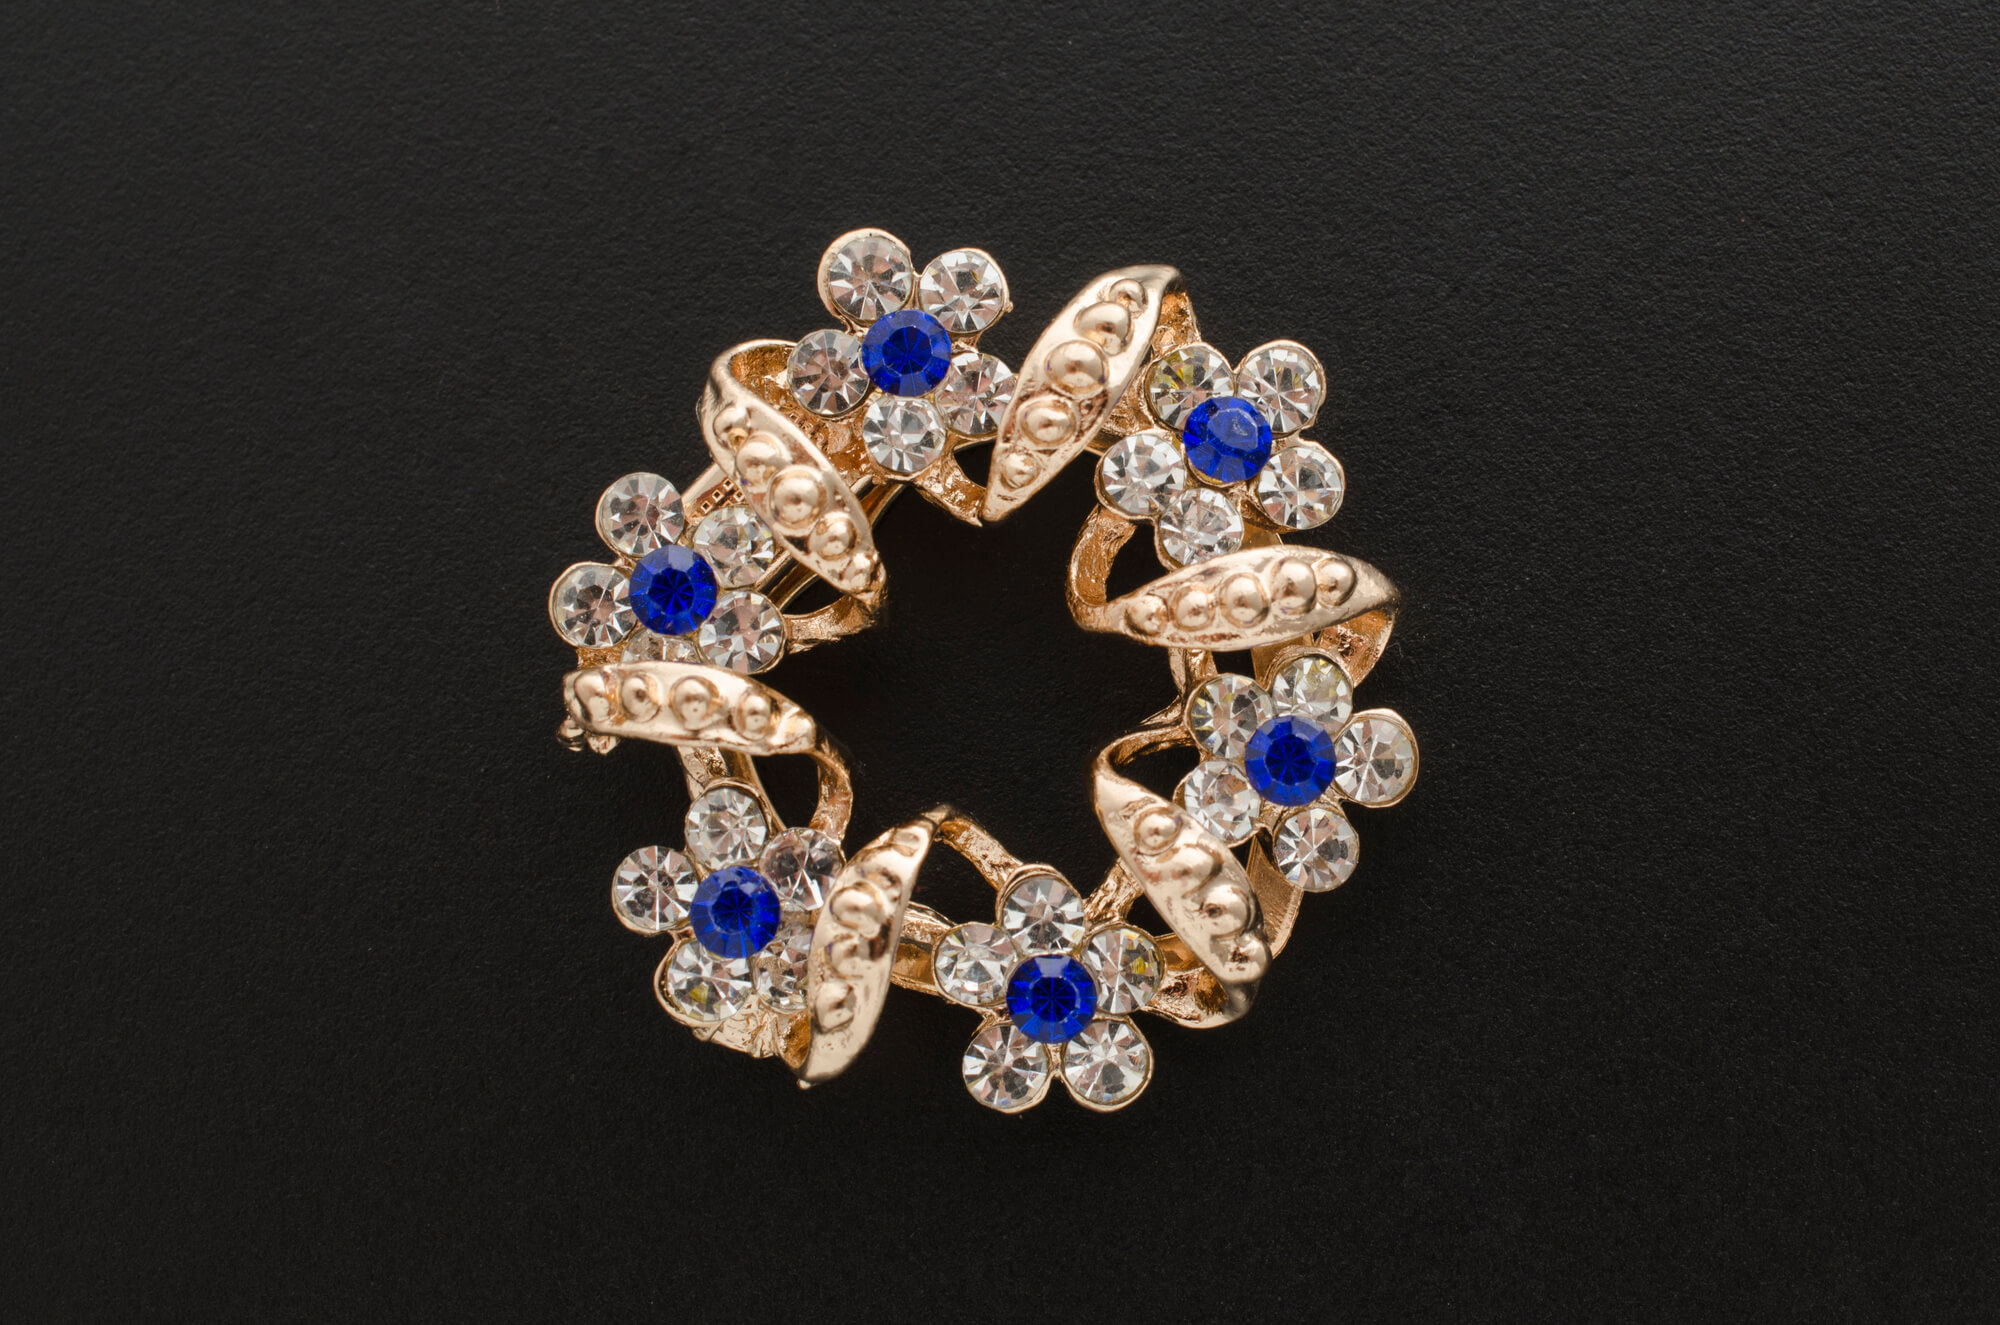 How Old Are Diamonds Shira Diamonds, Shira Diamonds